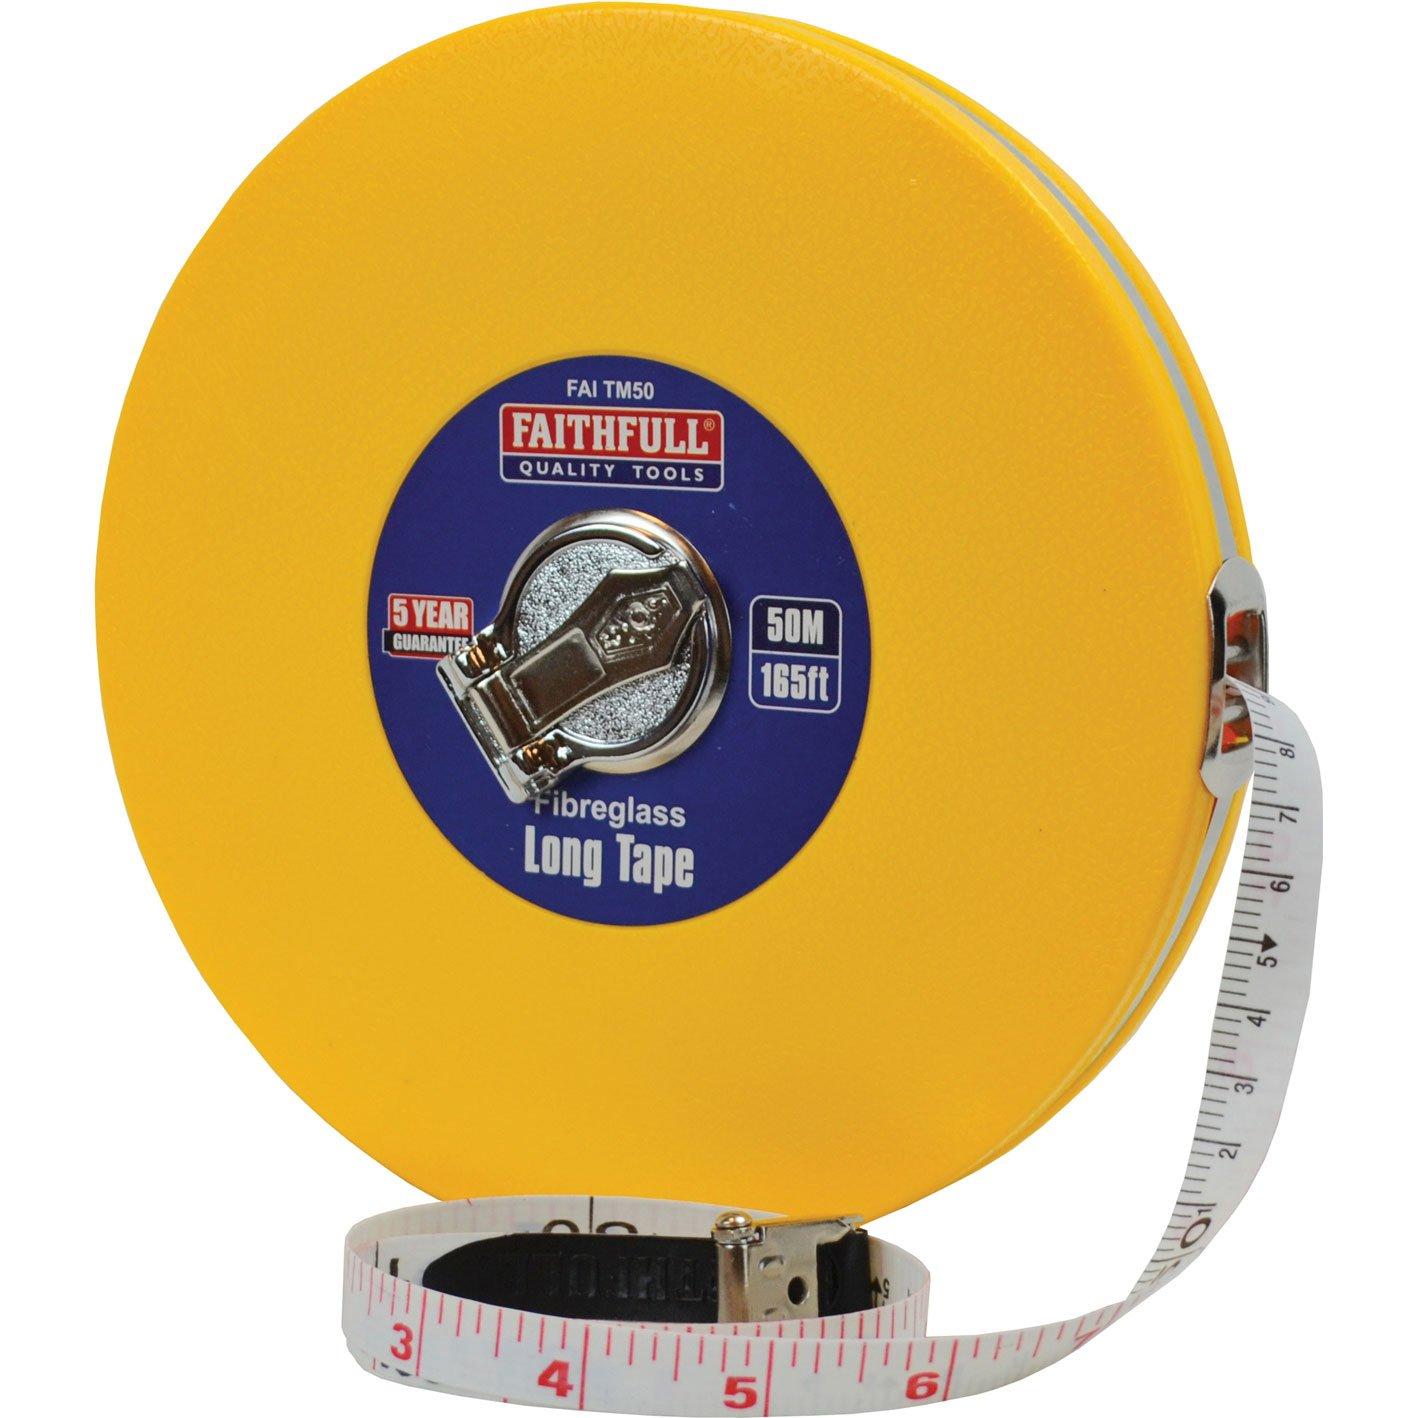 Faithfull Tools faitm50 50 m/165 ft geschlossen ABS Fiberglas lang Tape –  Gelb